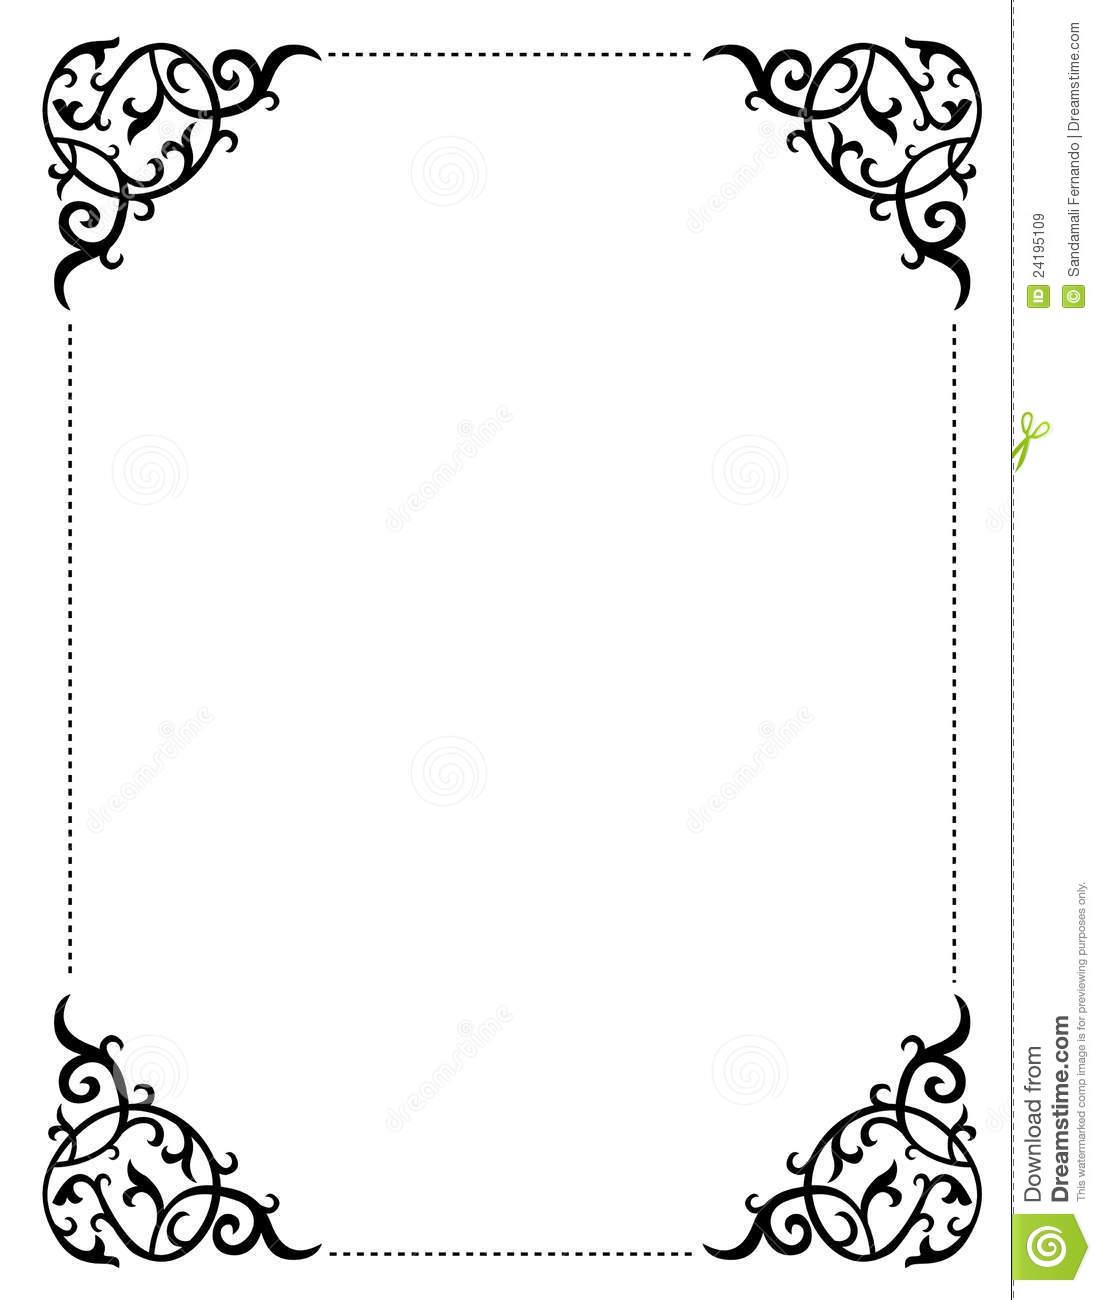 5 Images of Printable Wedding Invitation Borders